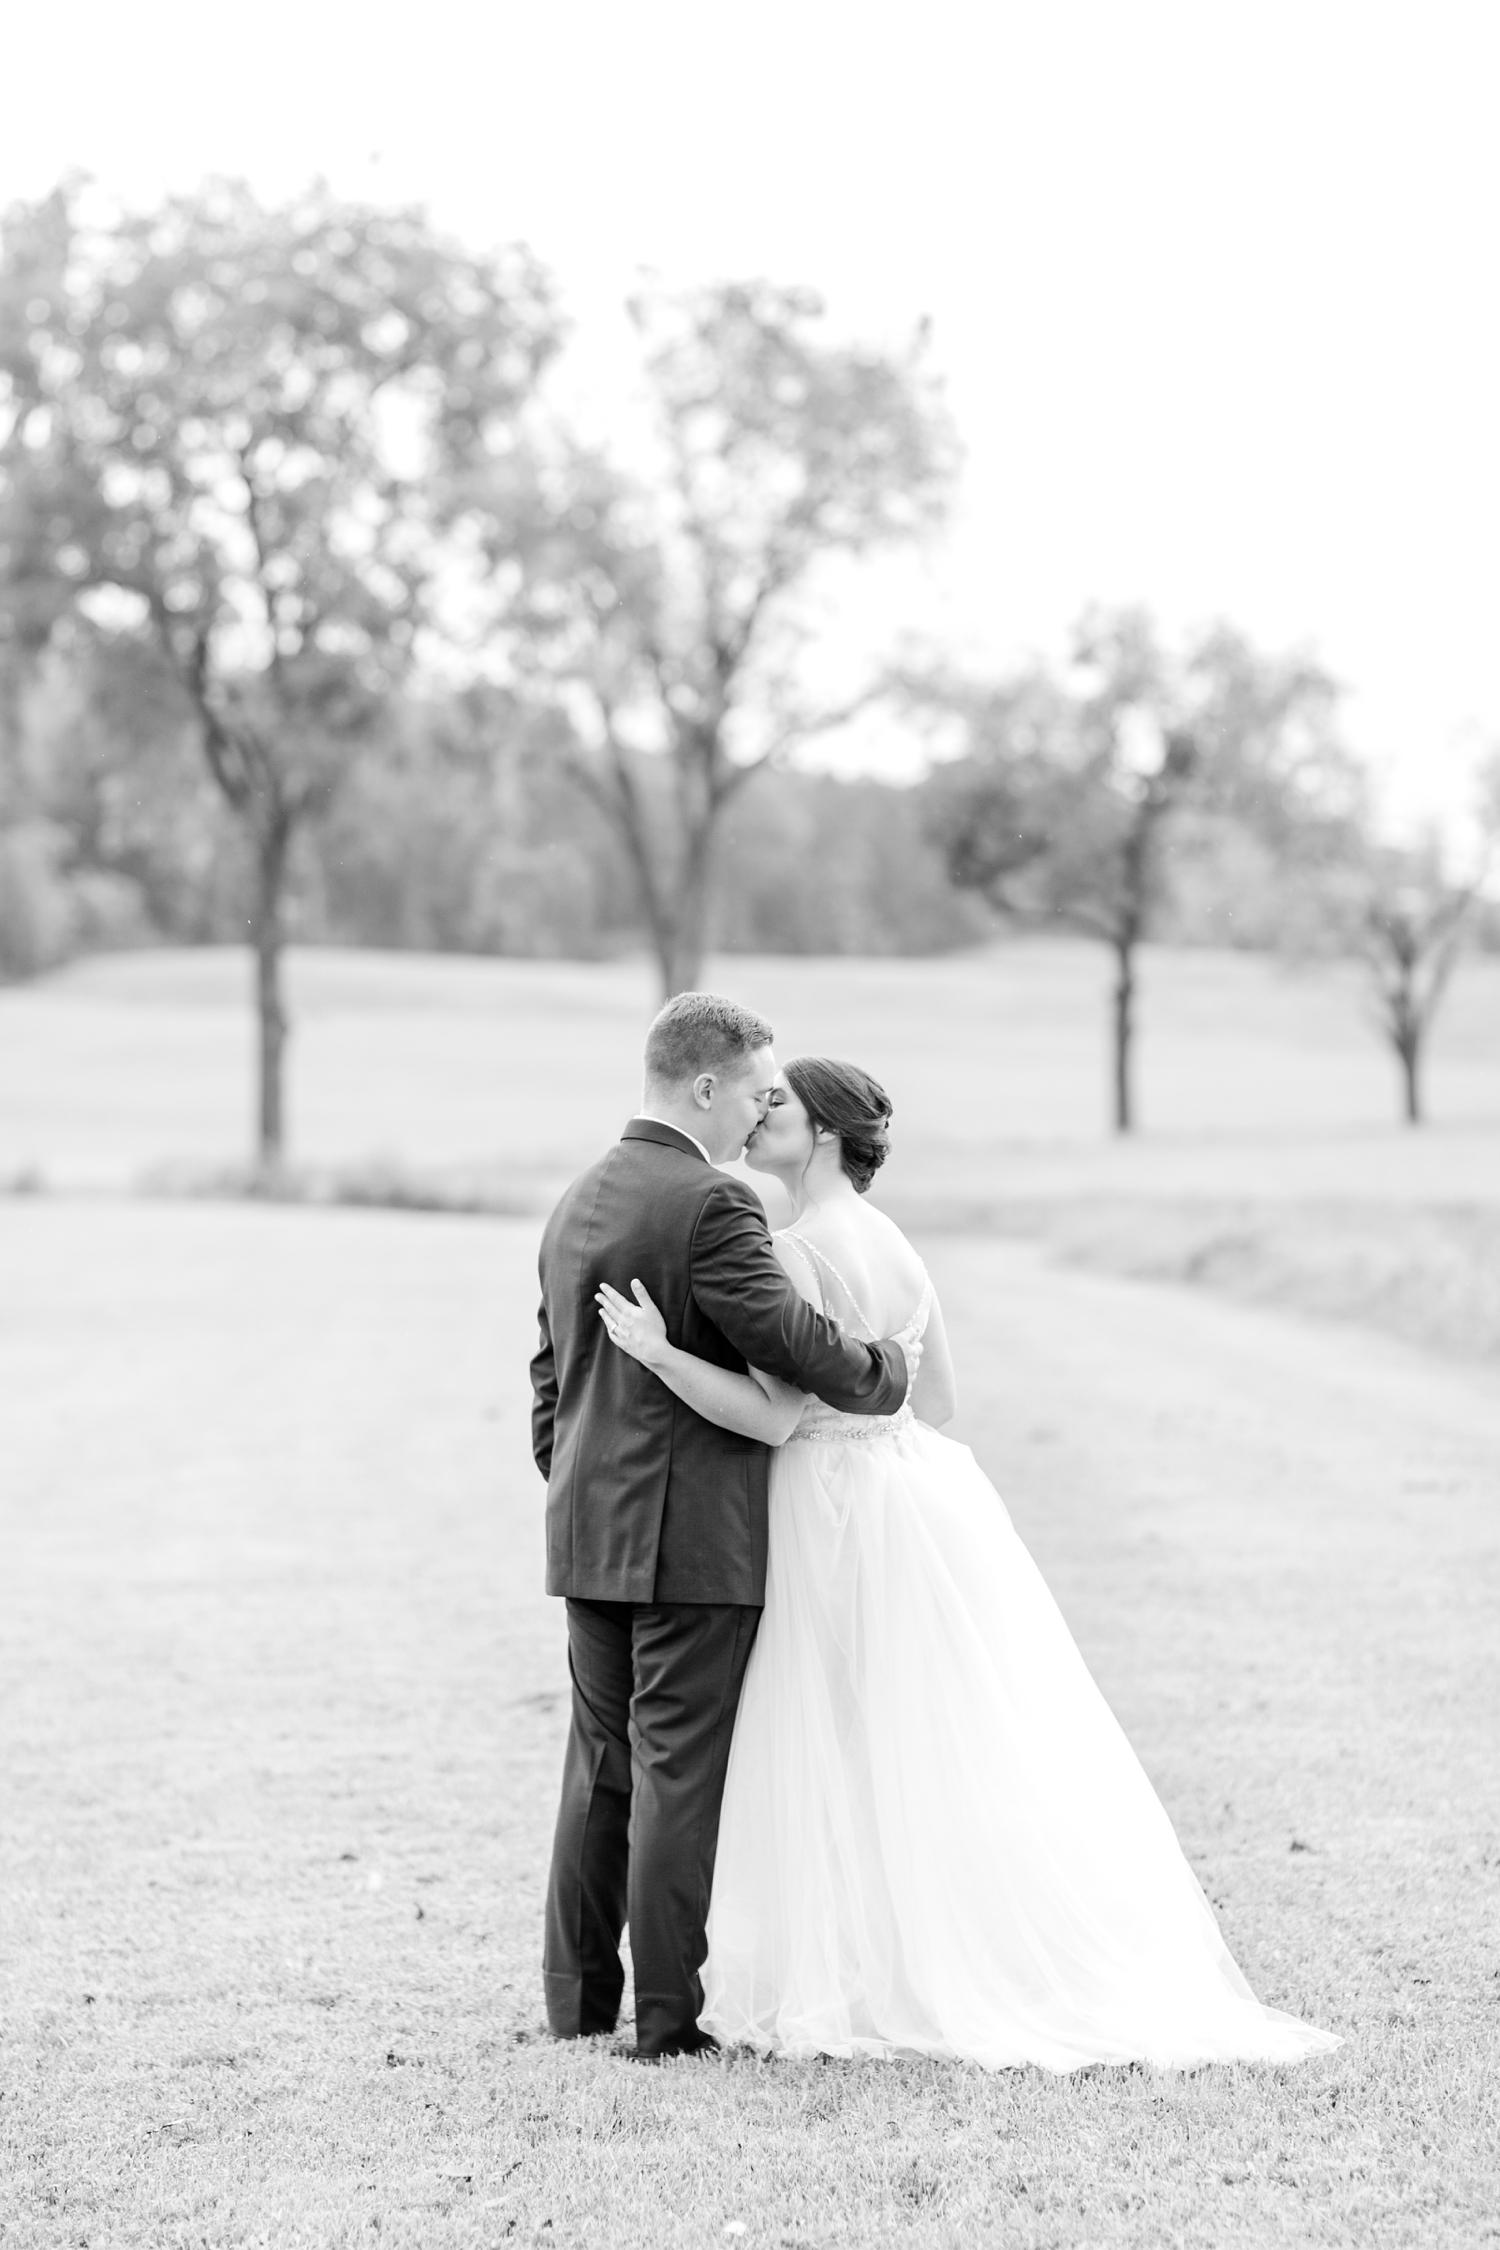 ADKINS WEDDING HIGHLIGHTS-205_The-Granary-wedding-Valley-Pike-Farm-Market-Virginia-wedding-photographer-anna-grace-photography-photo.jpg